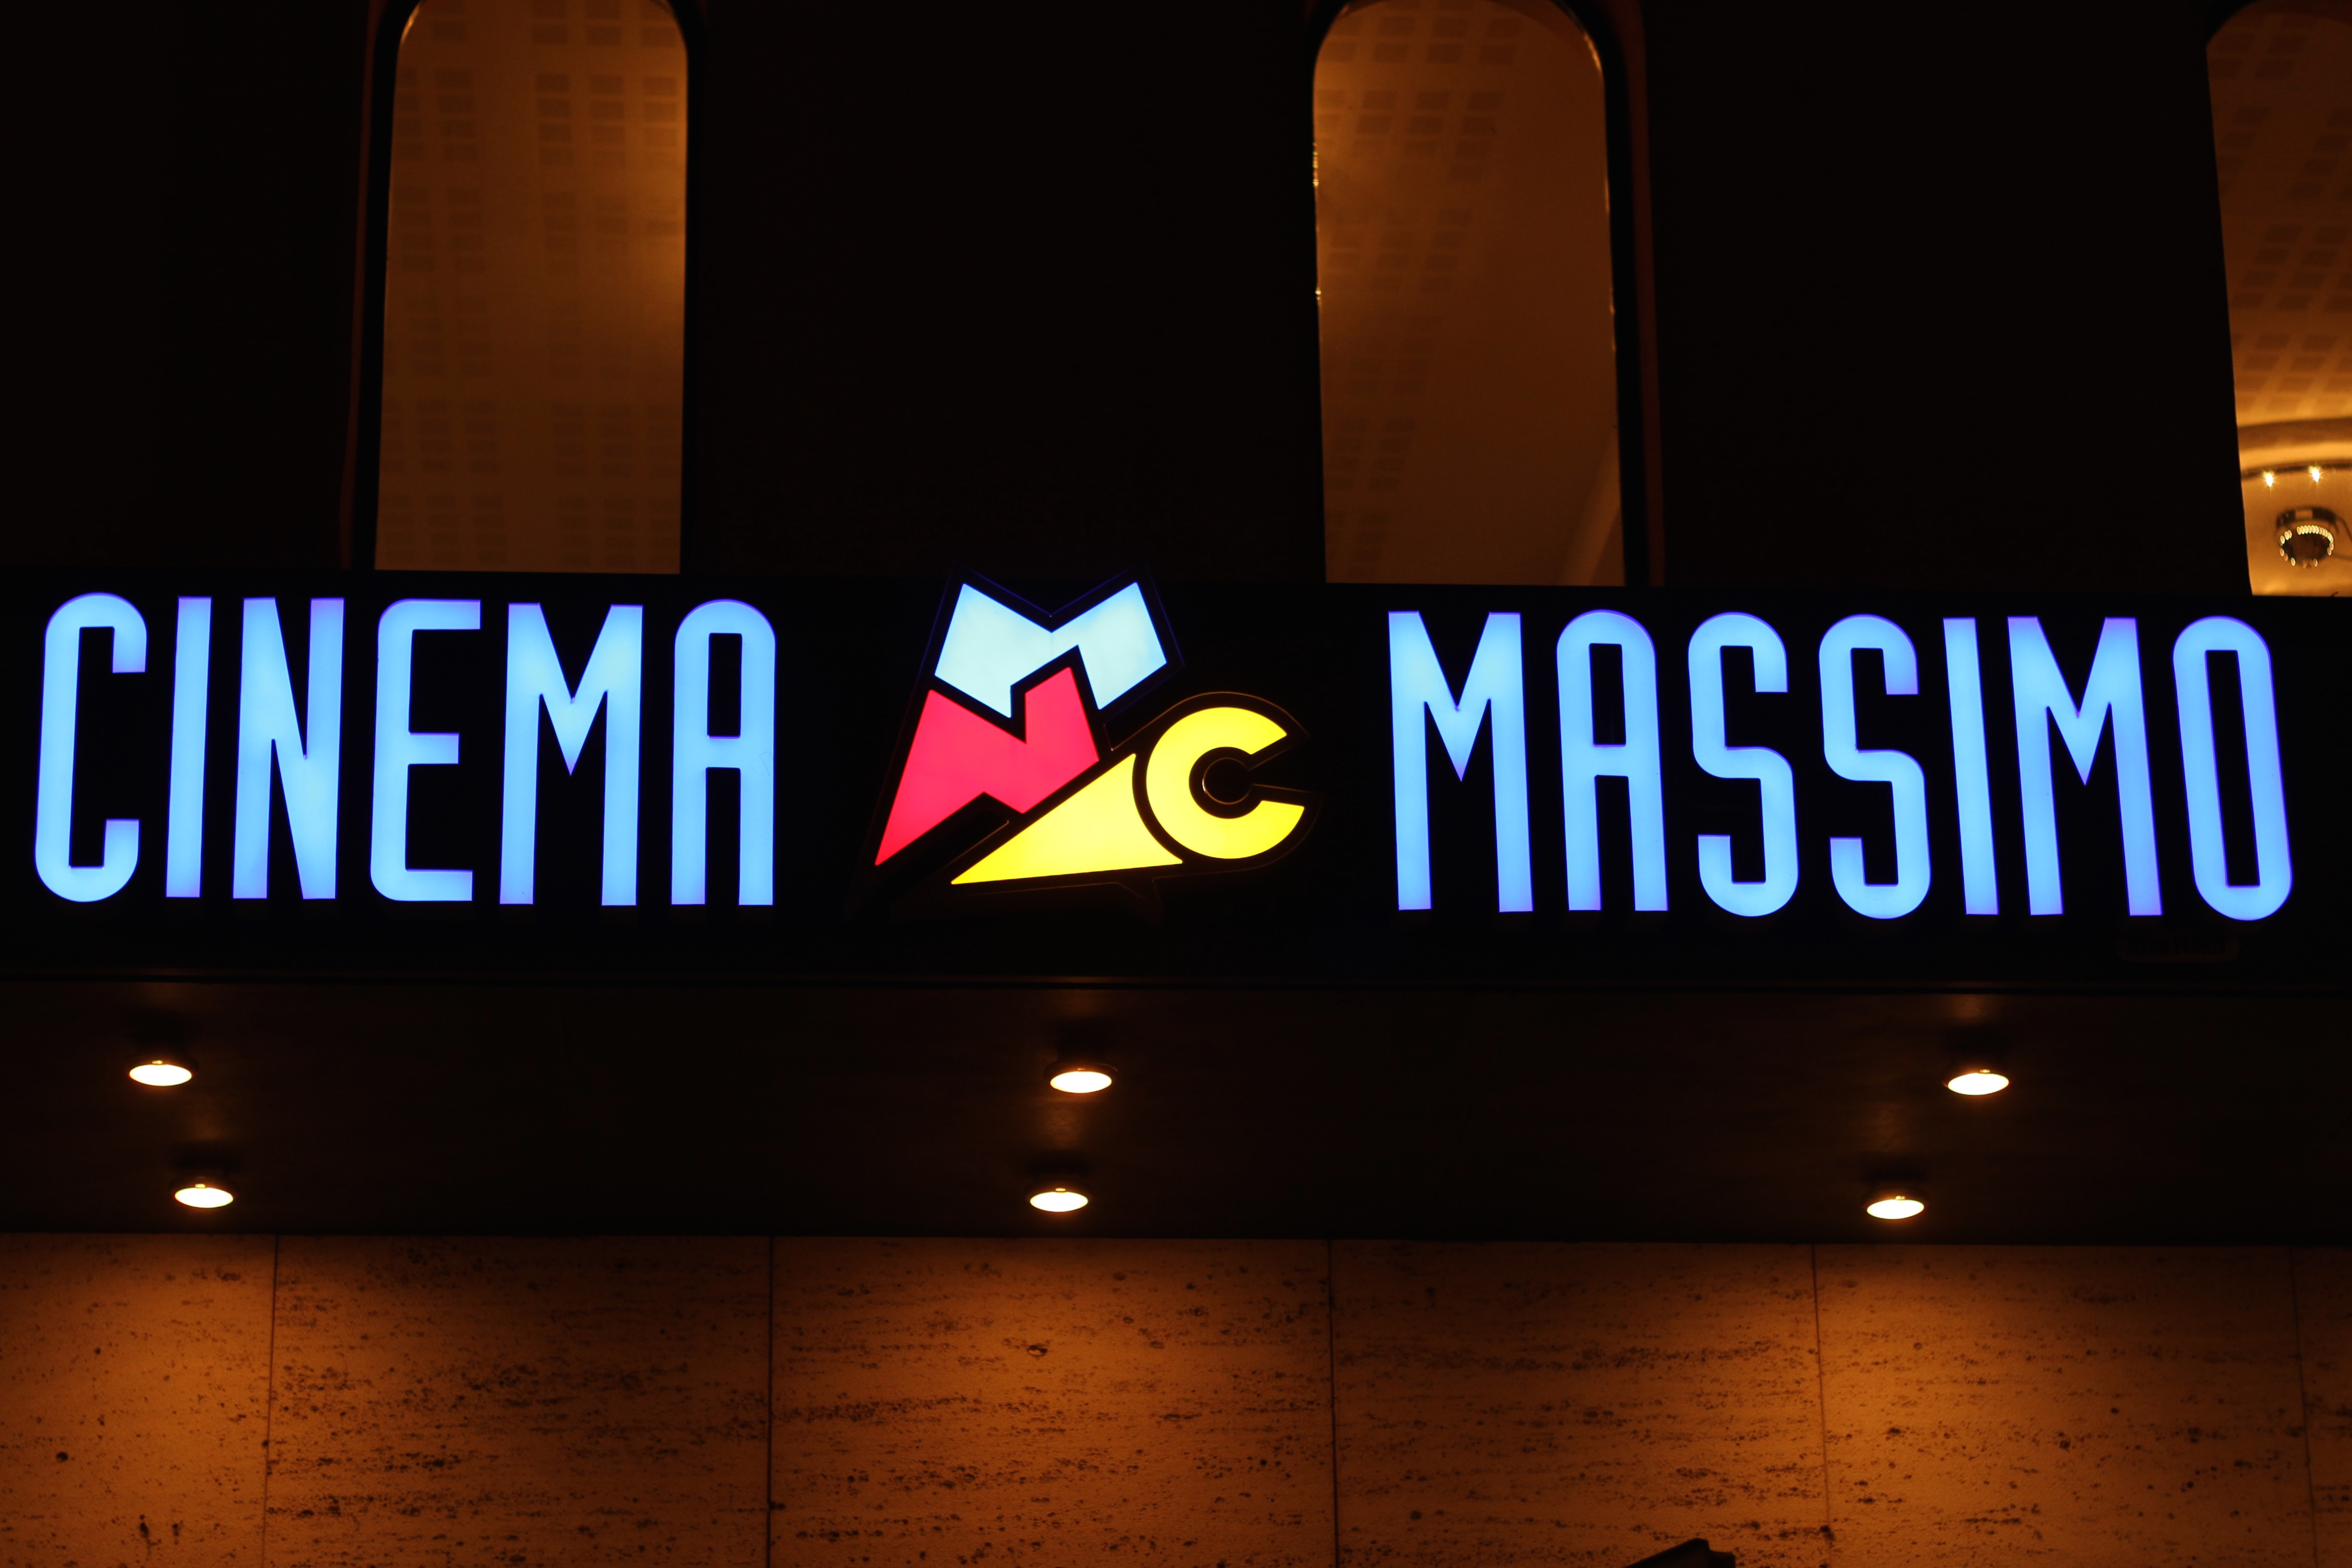 Cinema Massimo Torino 113